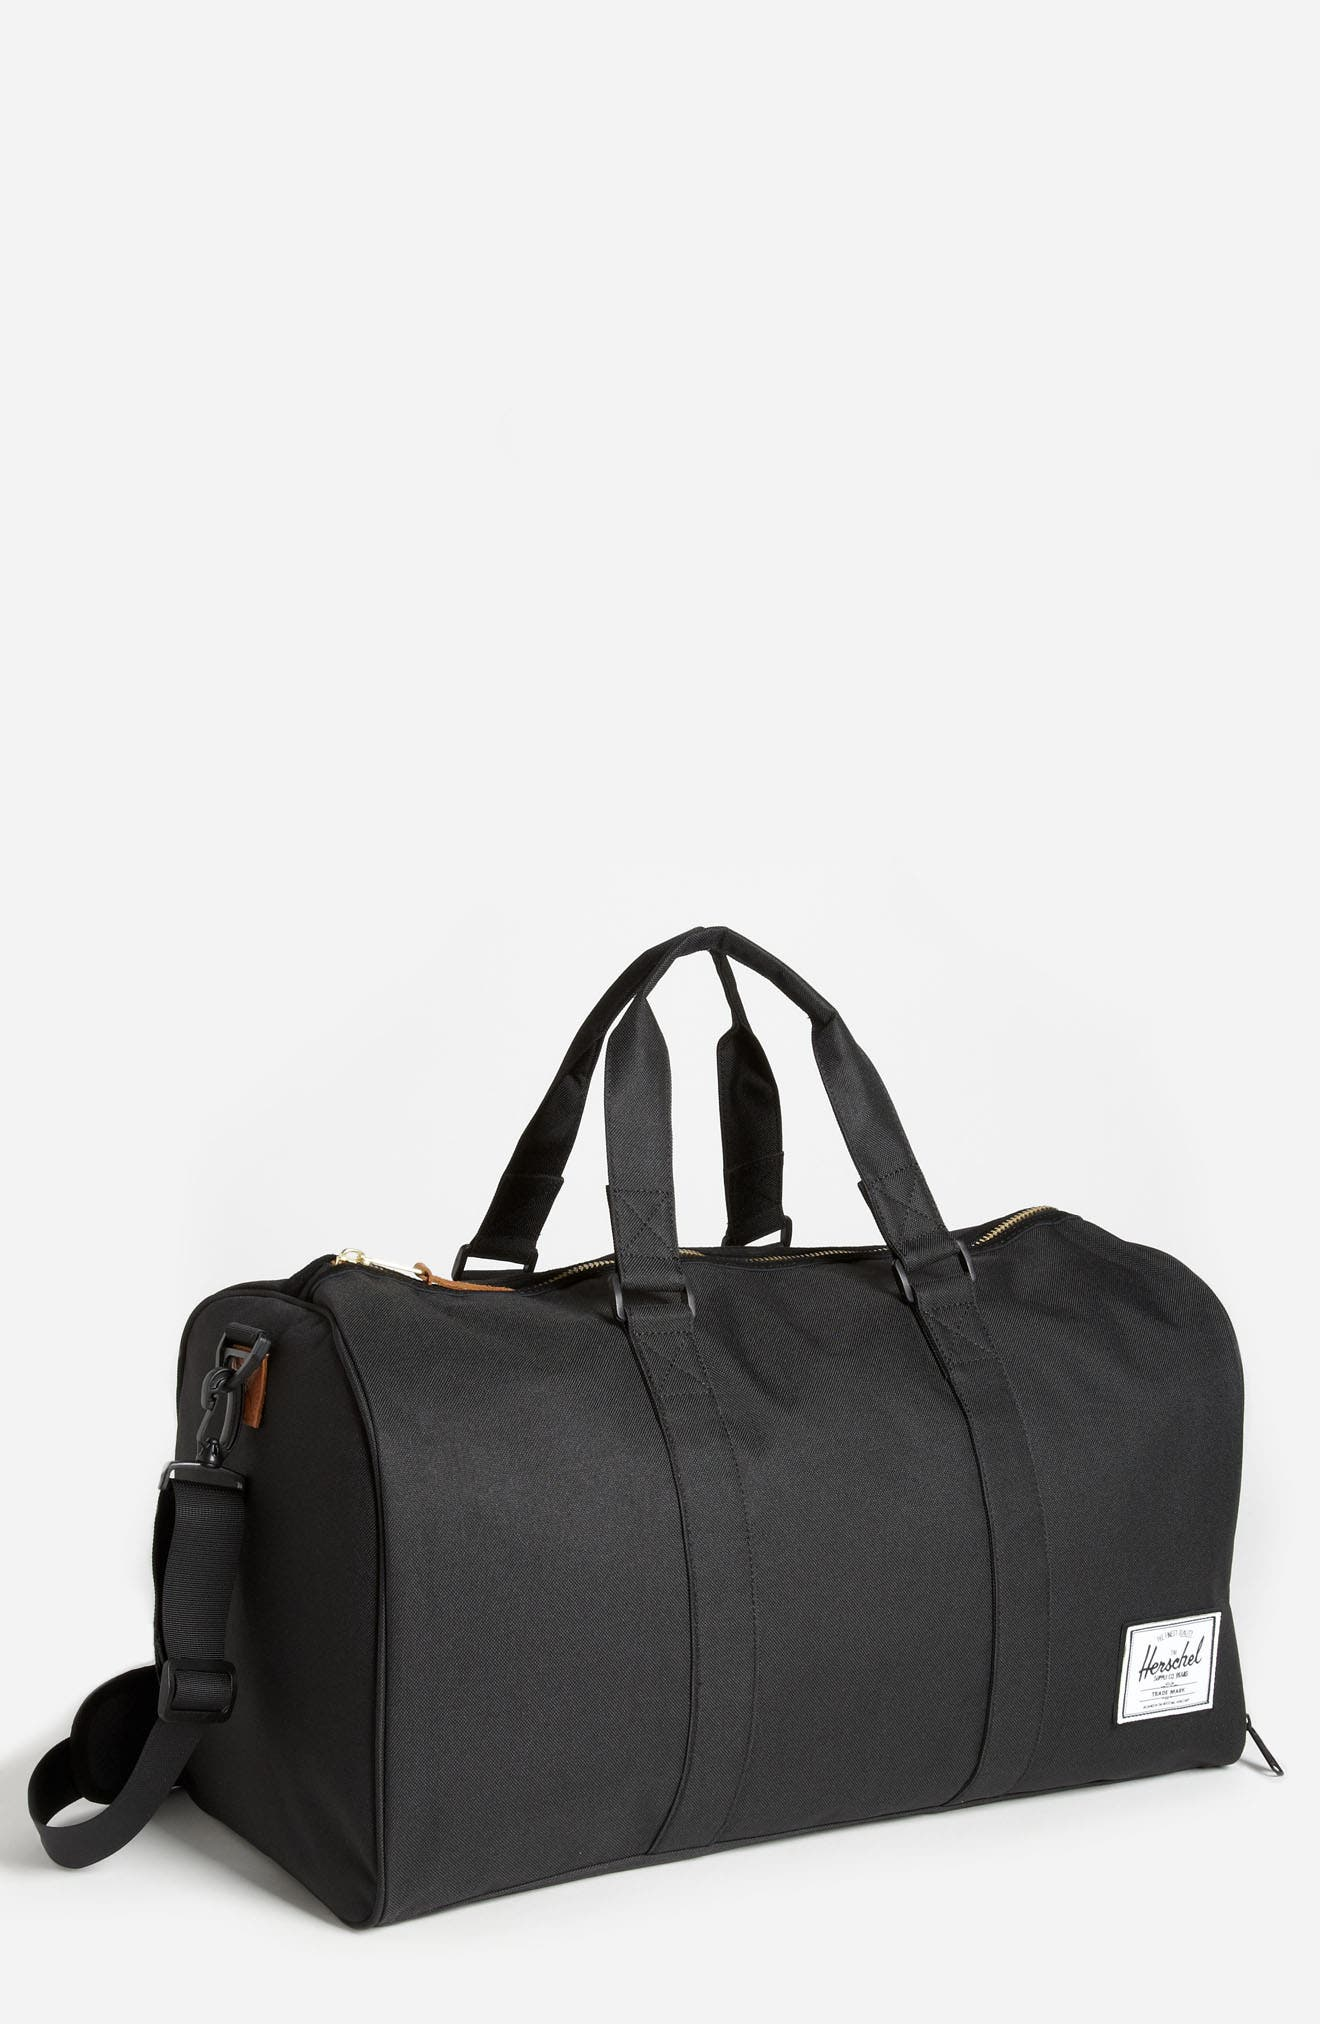 HERSCHEL SUPPLY CO. Novel Duffle Bag, Main, color, 001